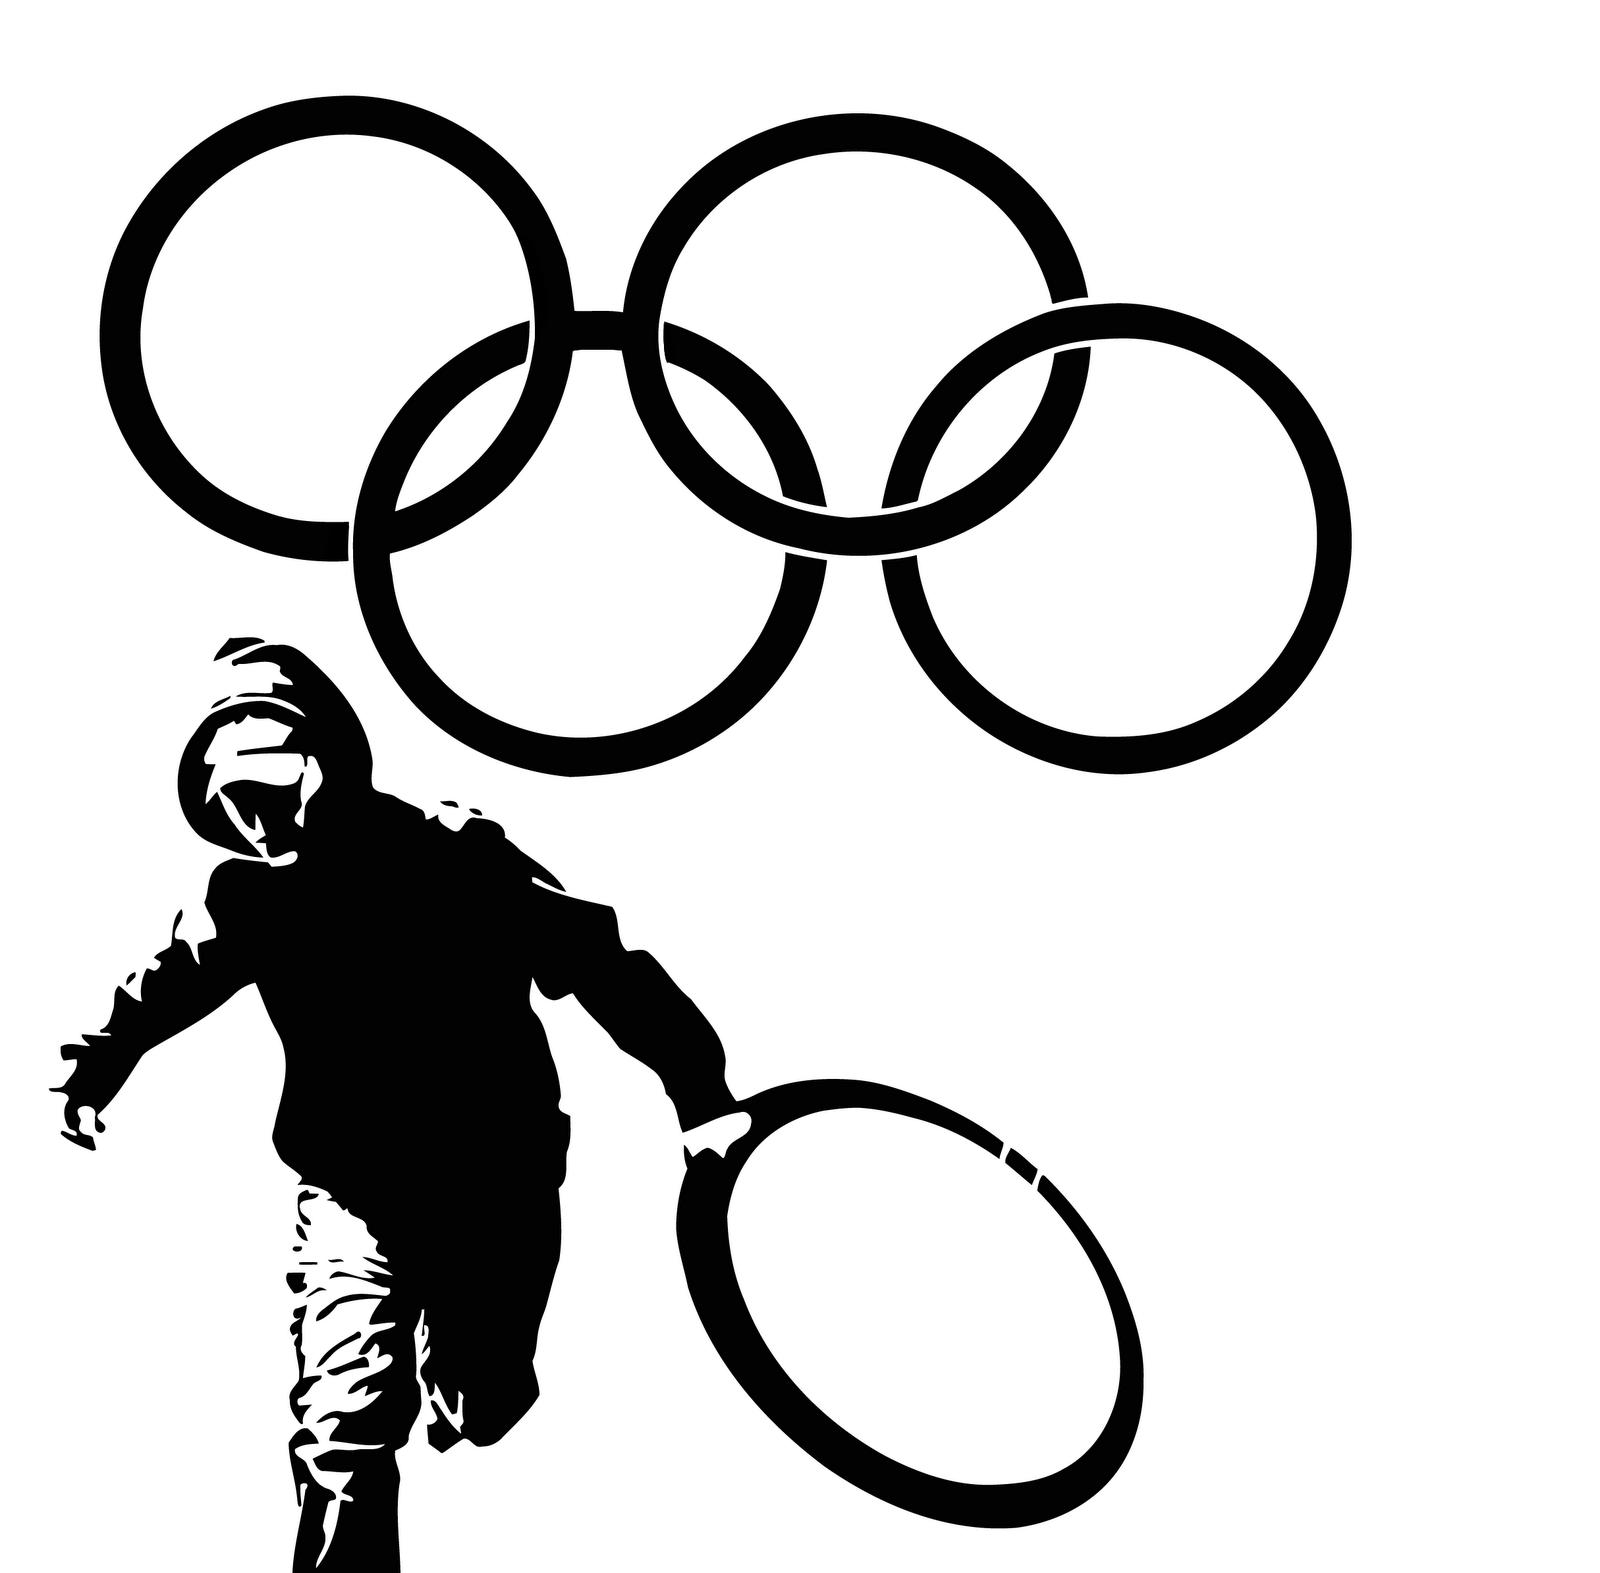 Olympic Games Thief Stencil - Free Graffiti Supplies